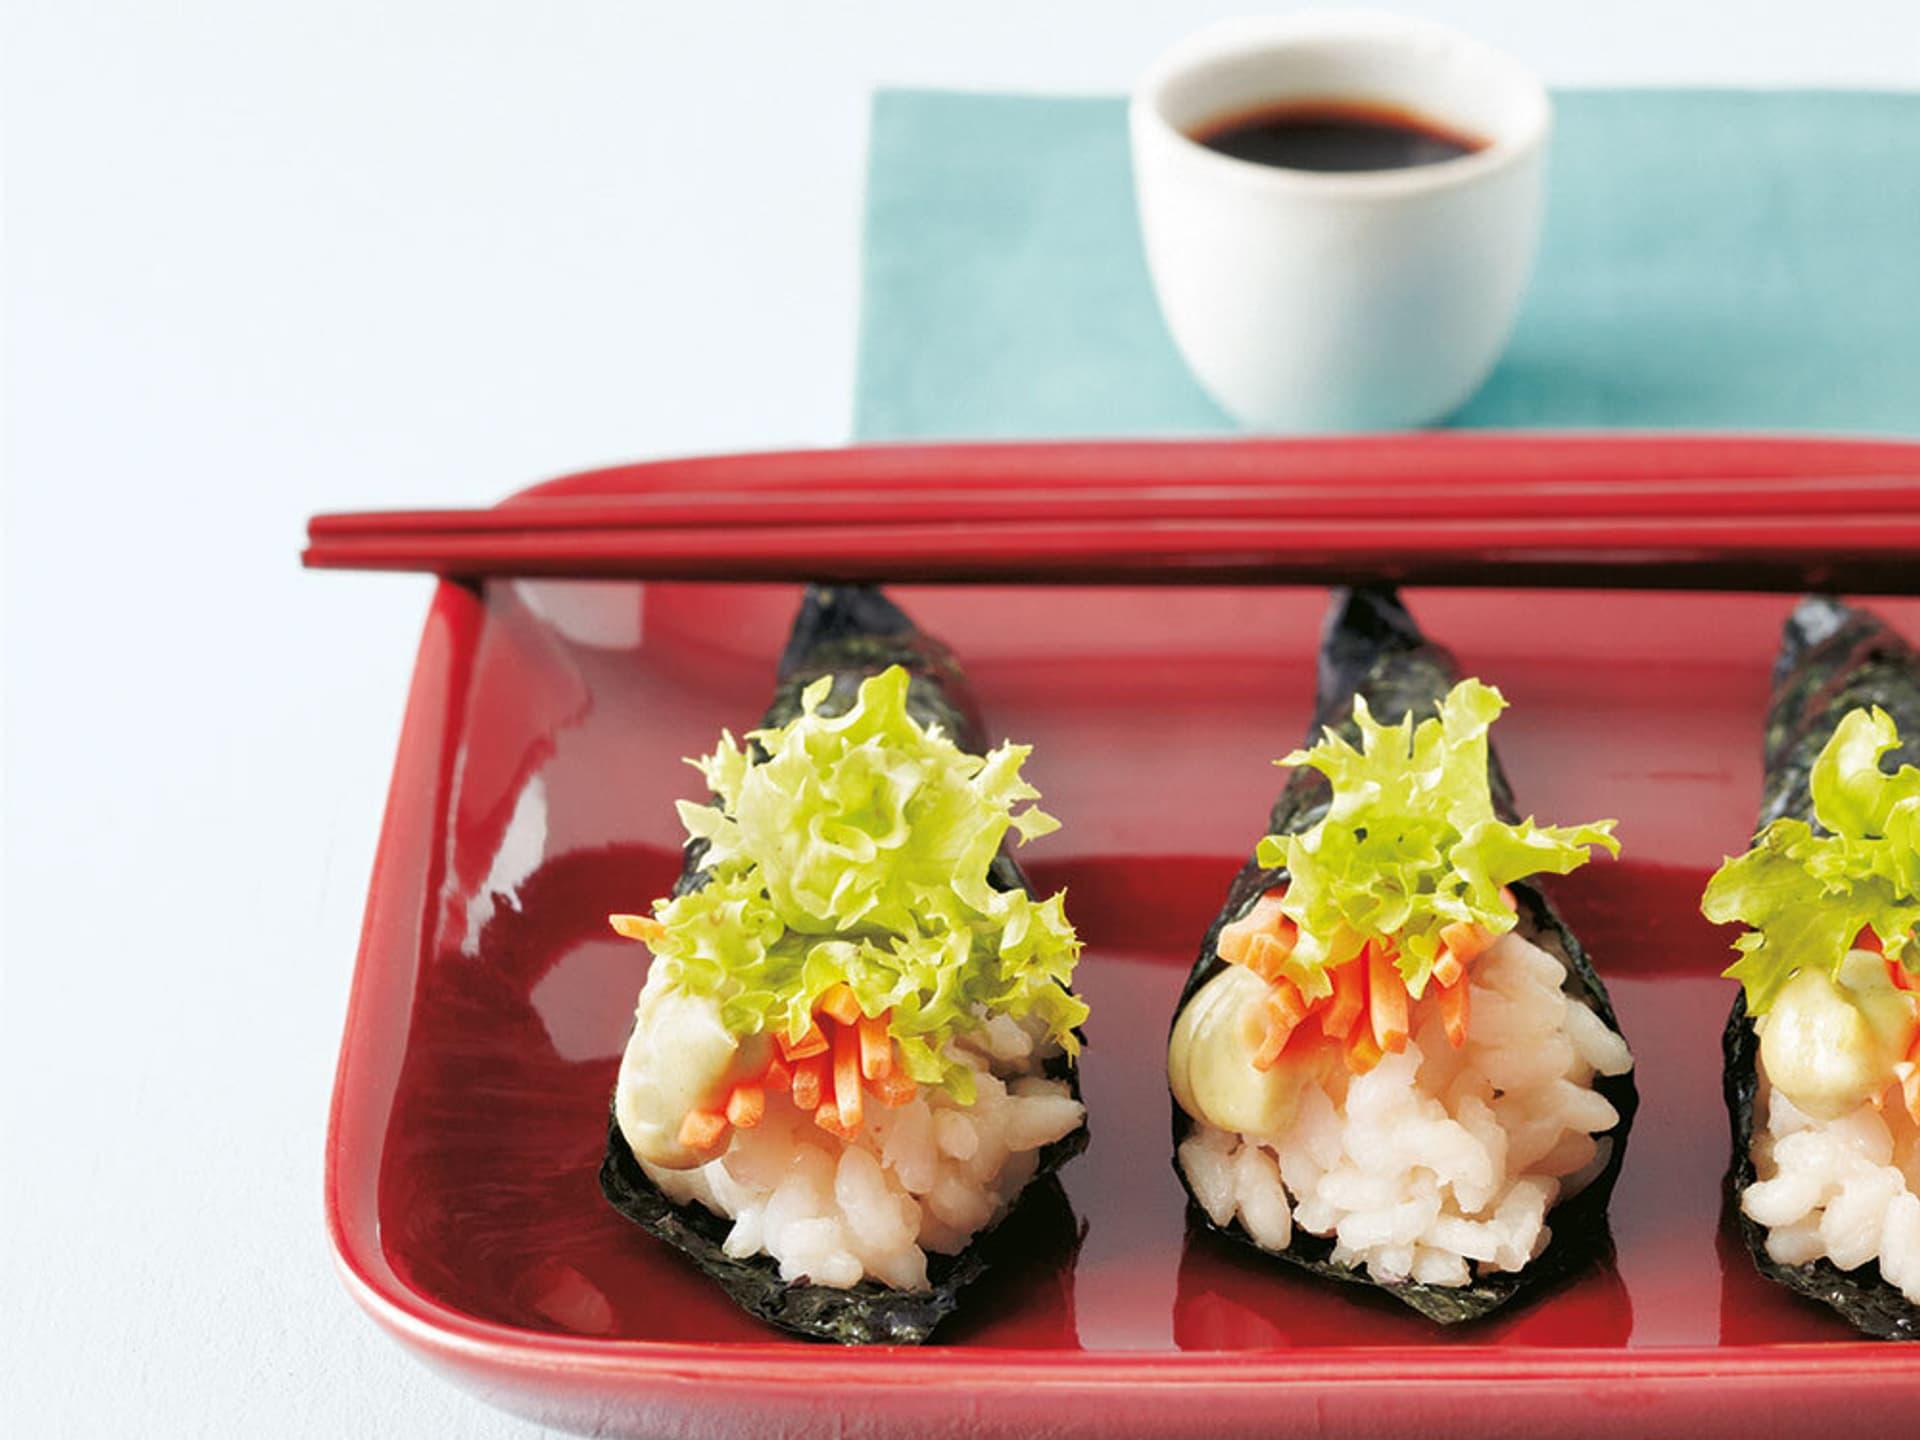 Sushi angerichtet auf rotem Tablett